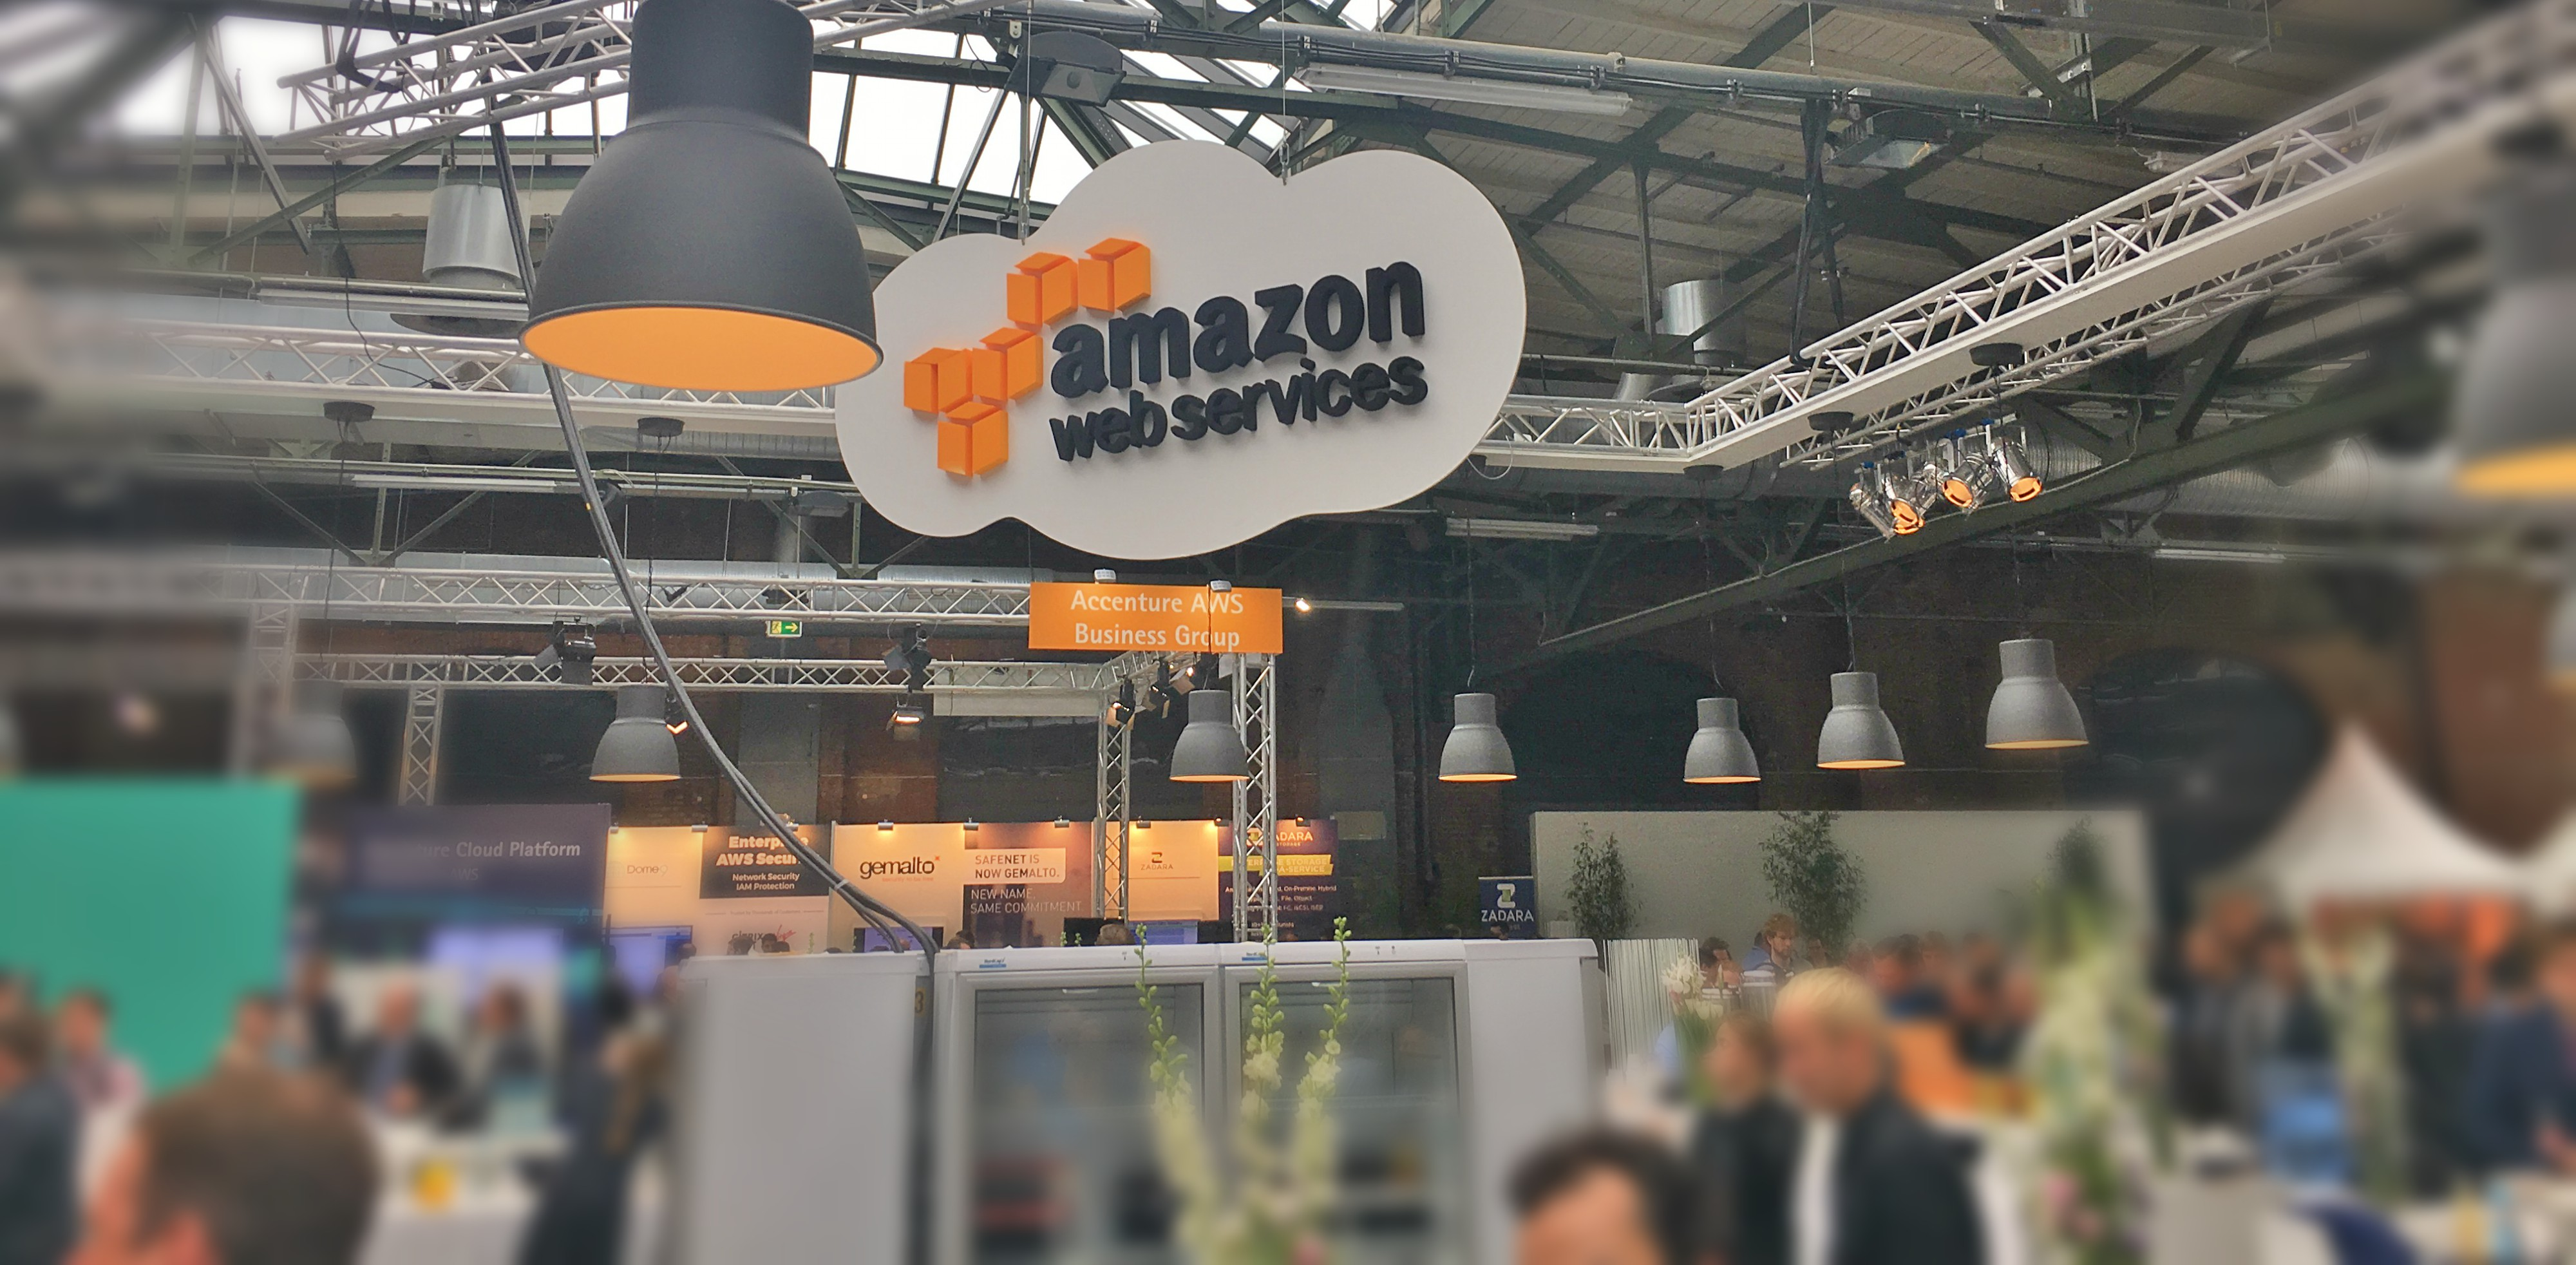 Recap of the AWS summit in Berlin